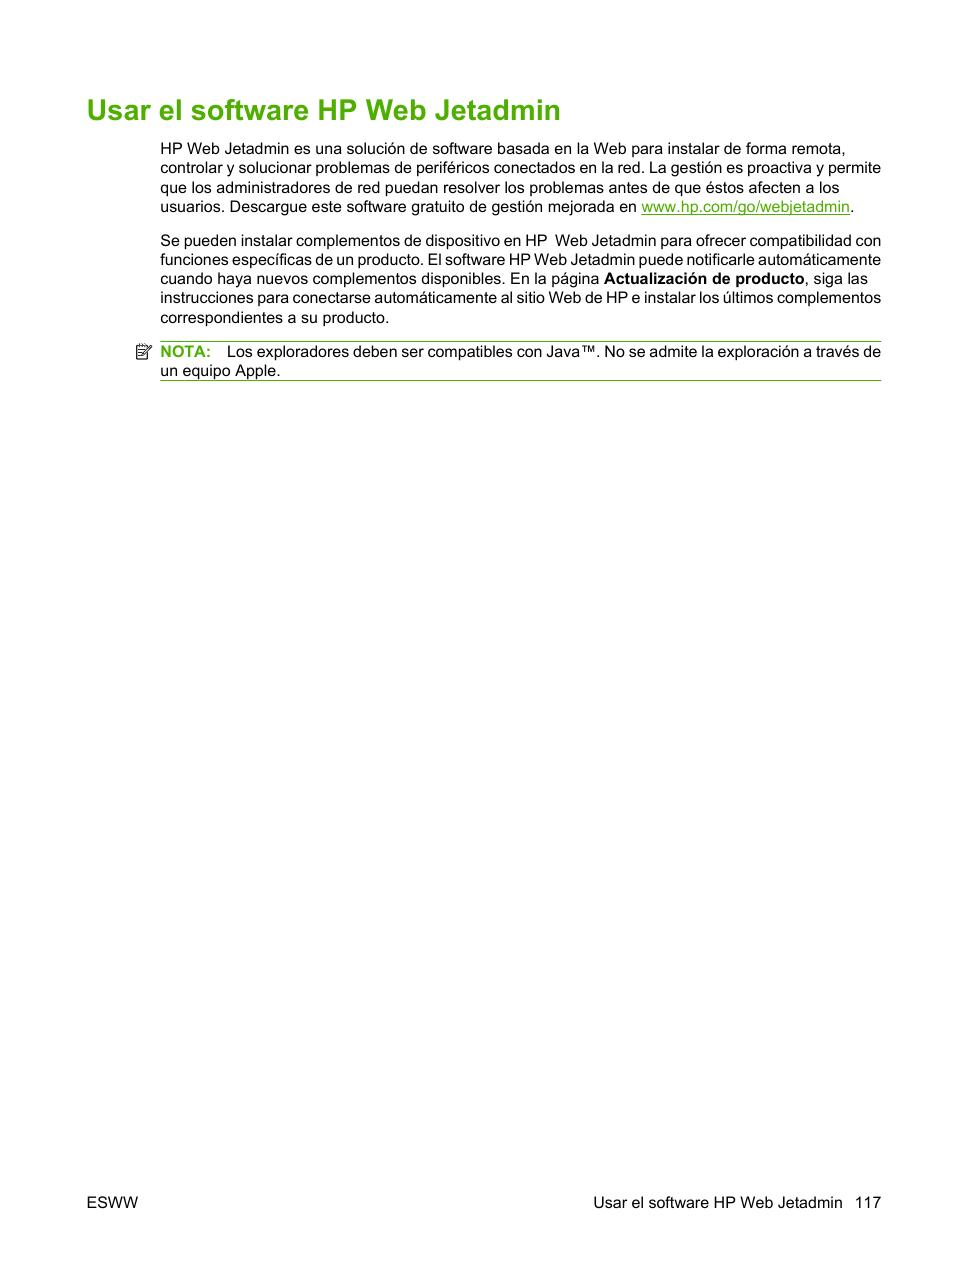 Usar el software hp web jetadmin | HP Laserjet p3015 Manual